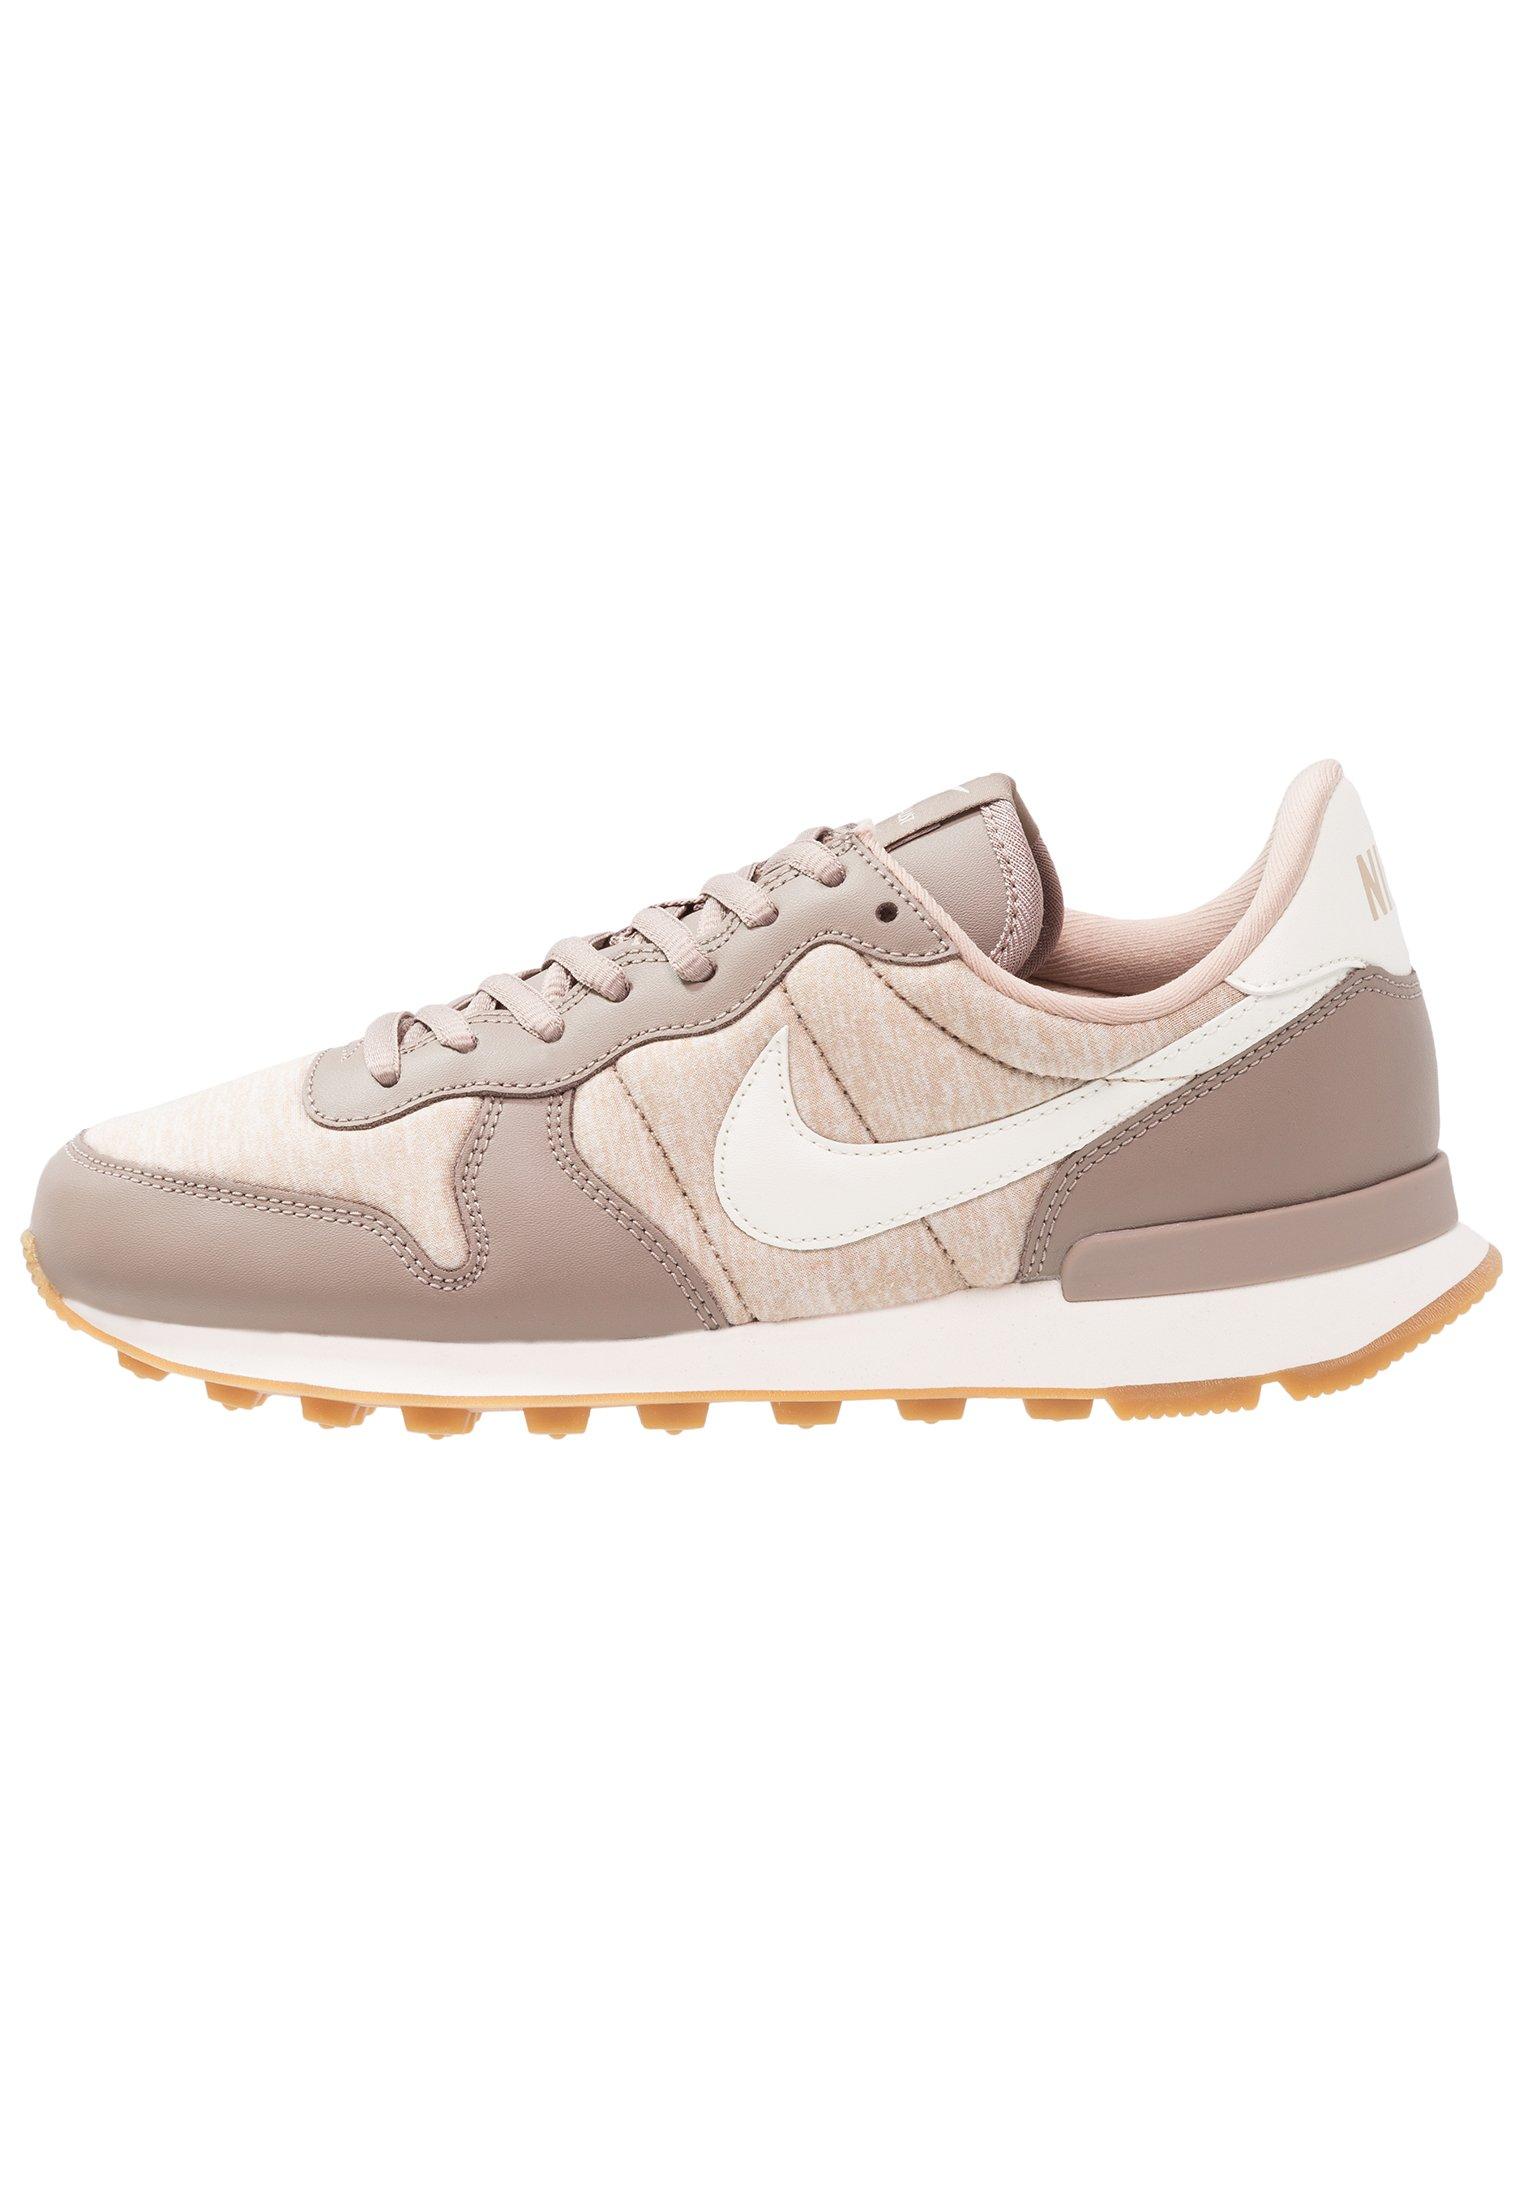 Nike Sportswear Internationalist - Sneaker Low Gunsmoke/sea Coral/atmosphere Grey/sail/light Brown Black Friday